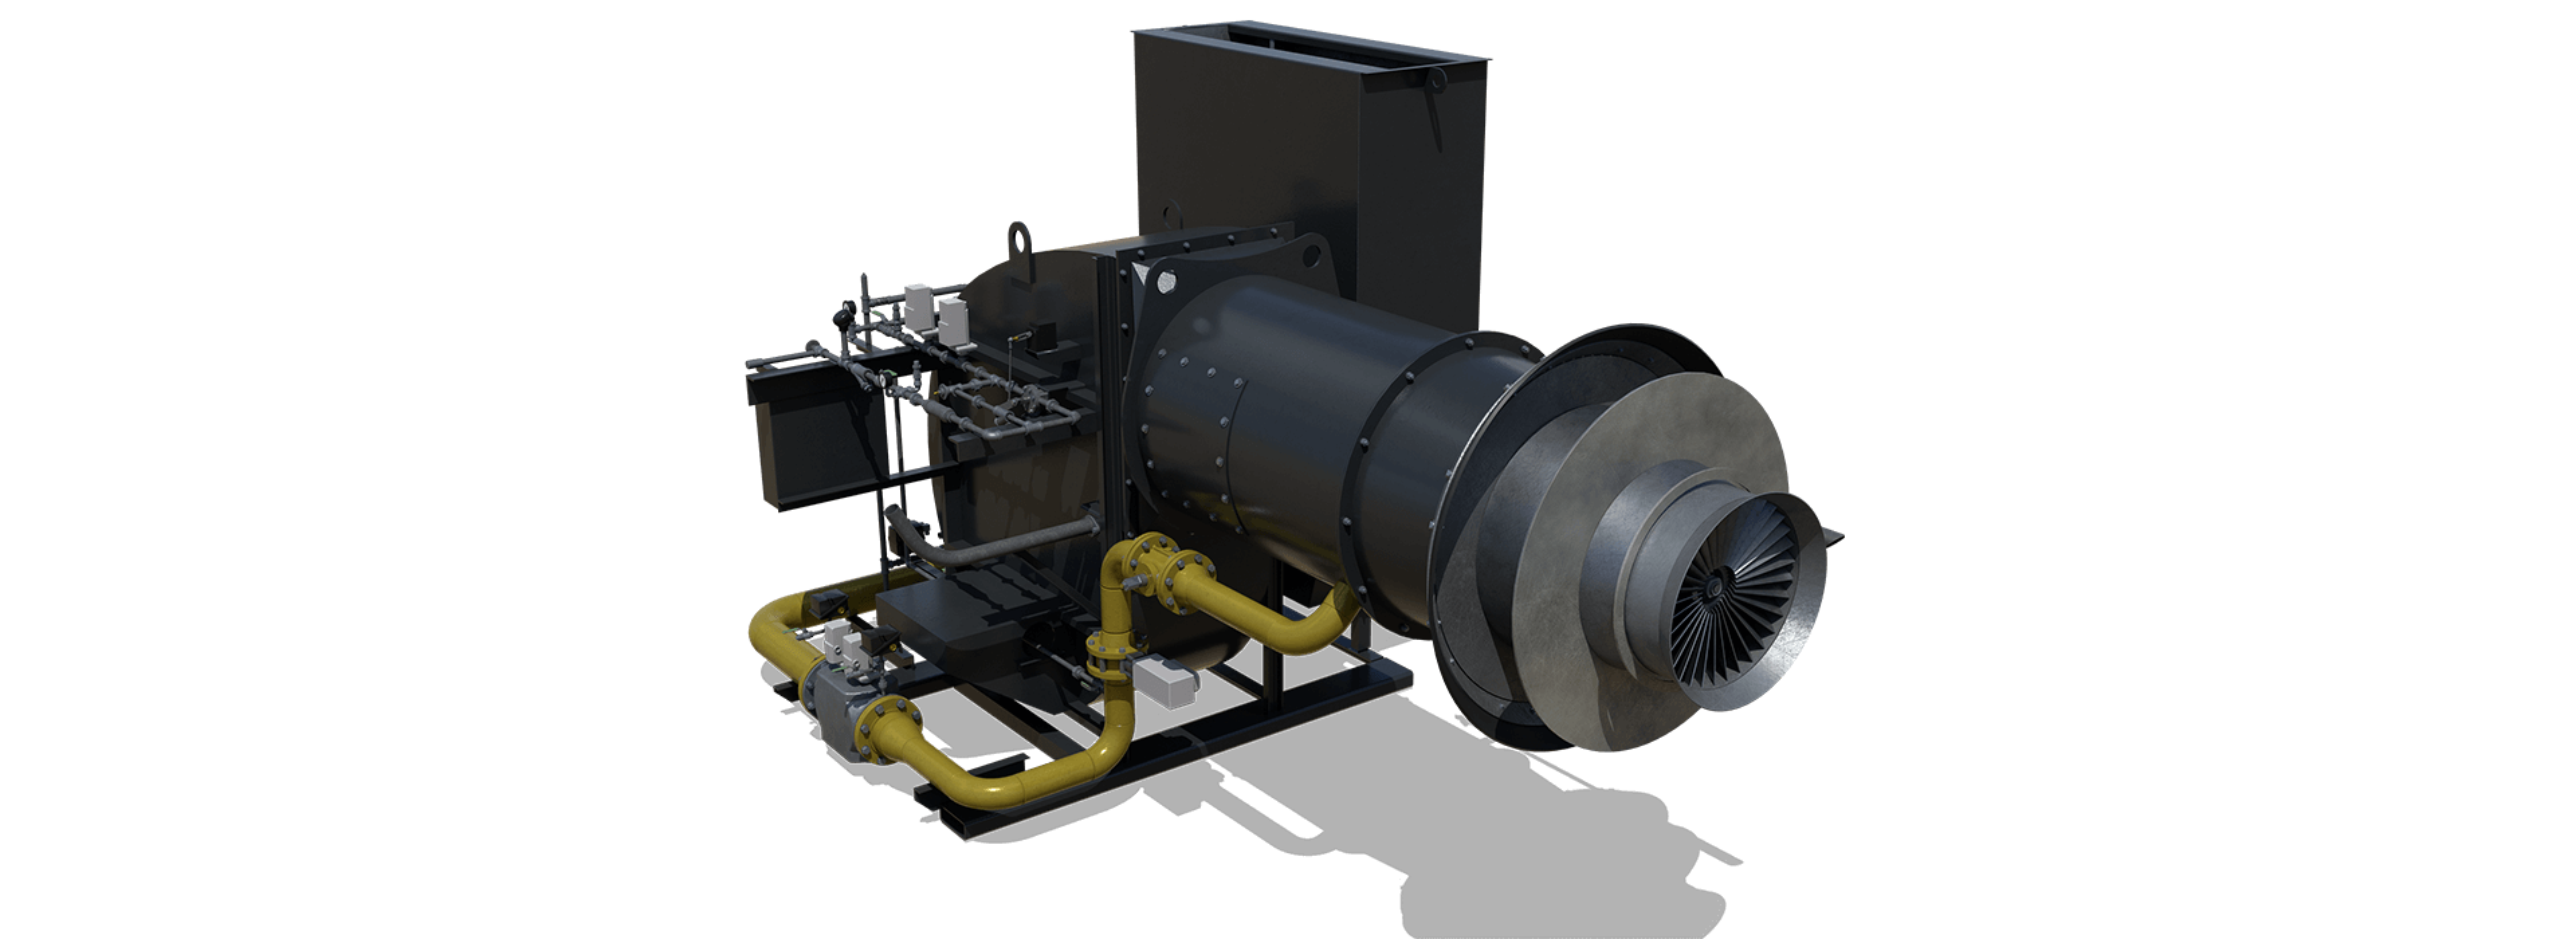 The Phoenix Talon II Burner for Aggregate Drying